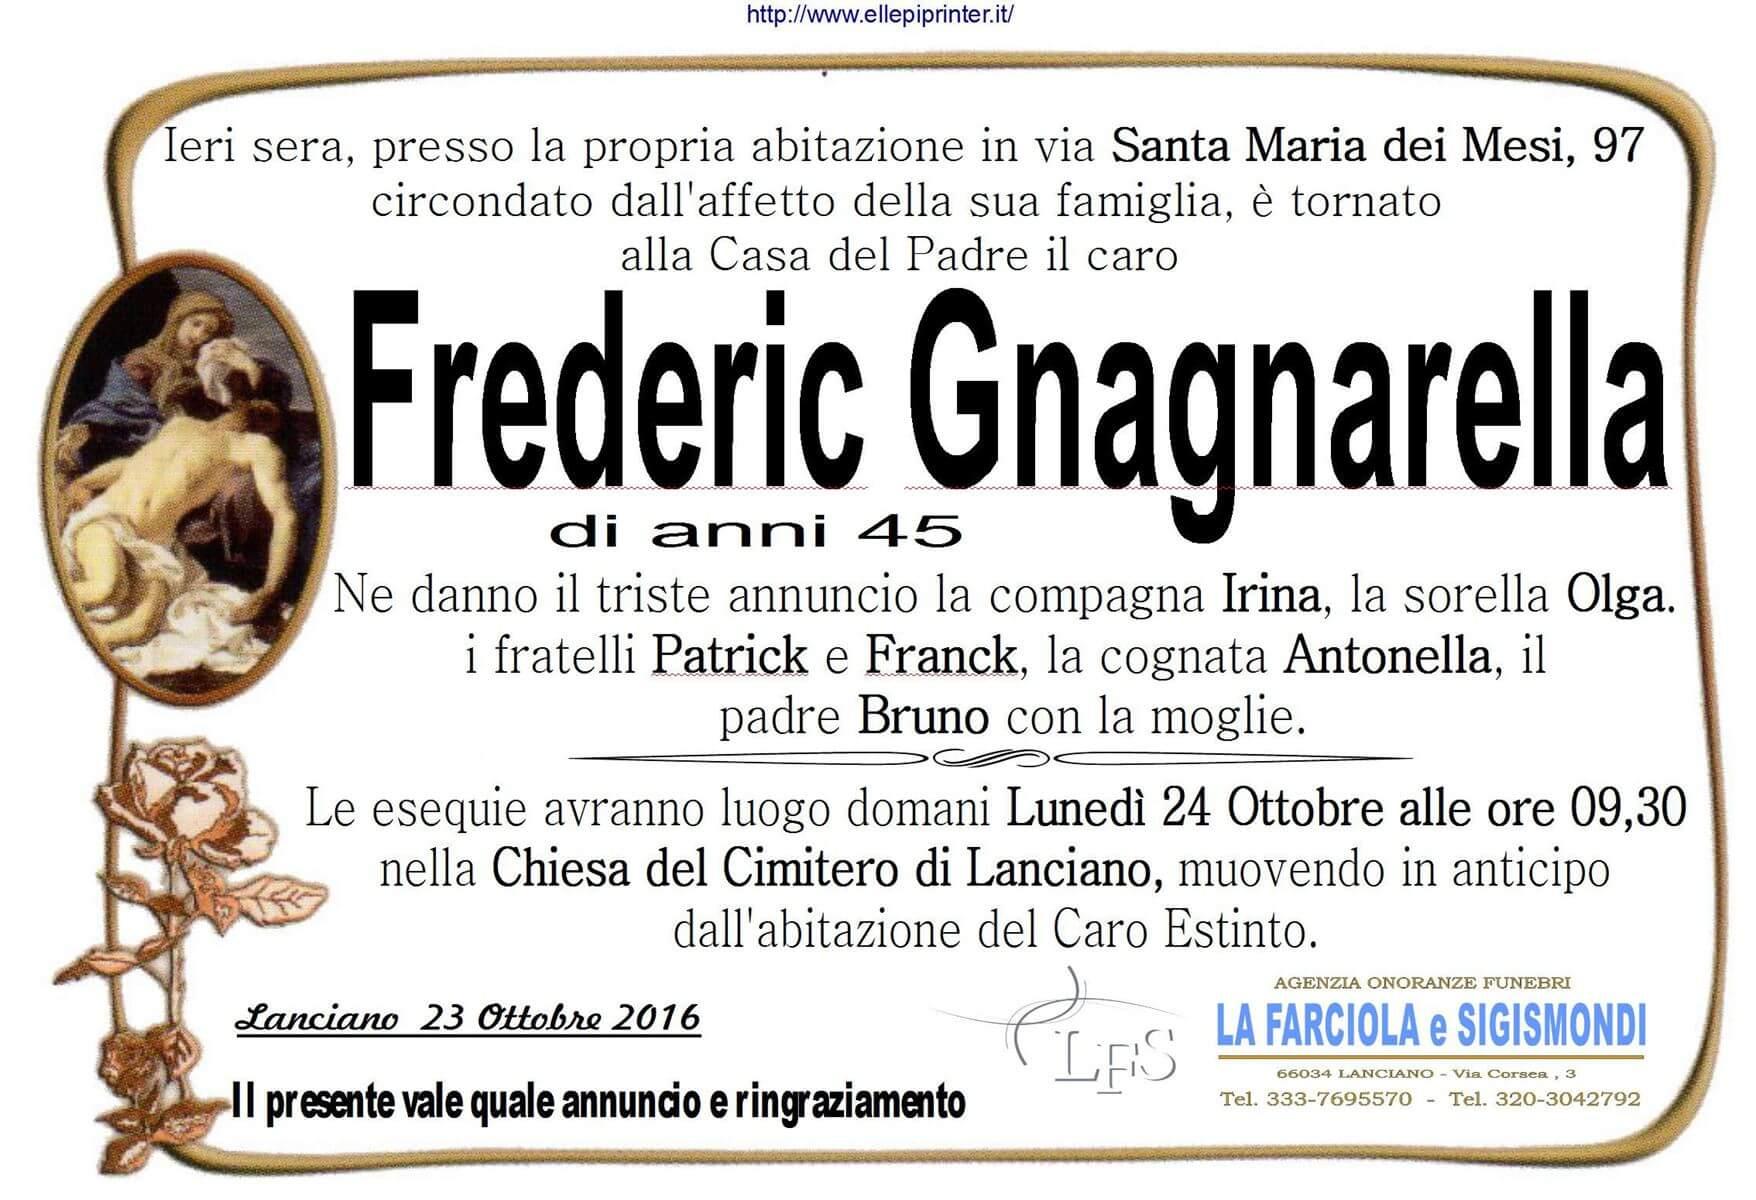 MANIFESTO GNAGNARELLA FREDERICK